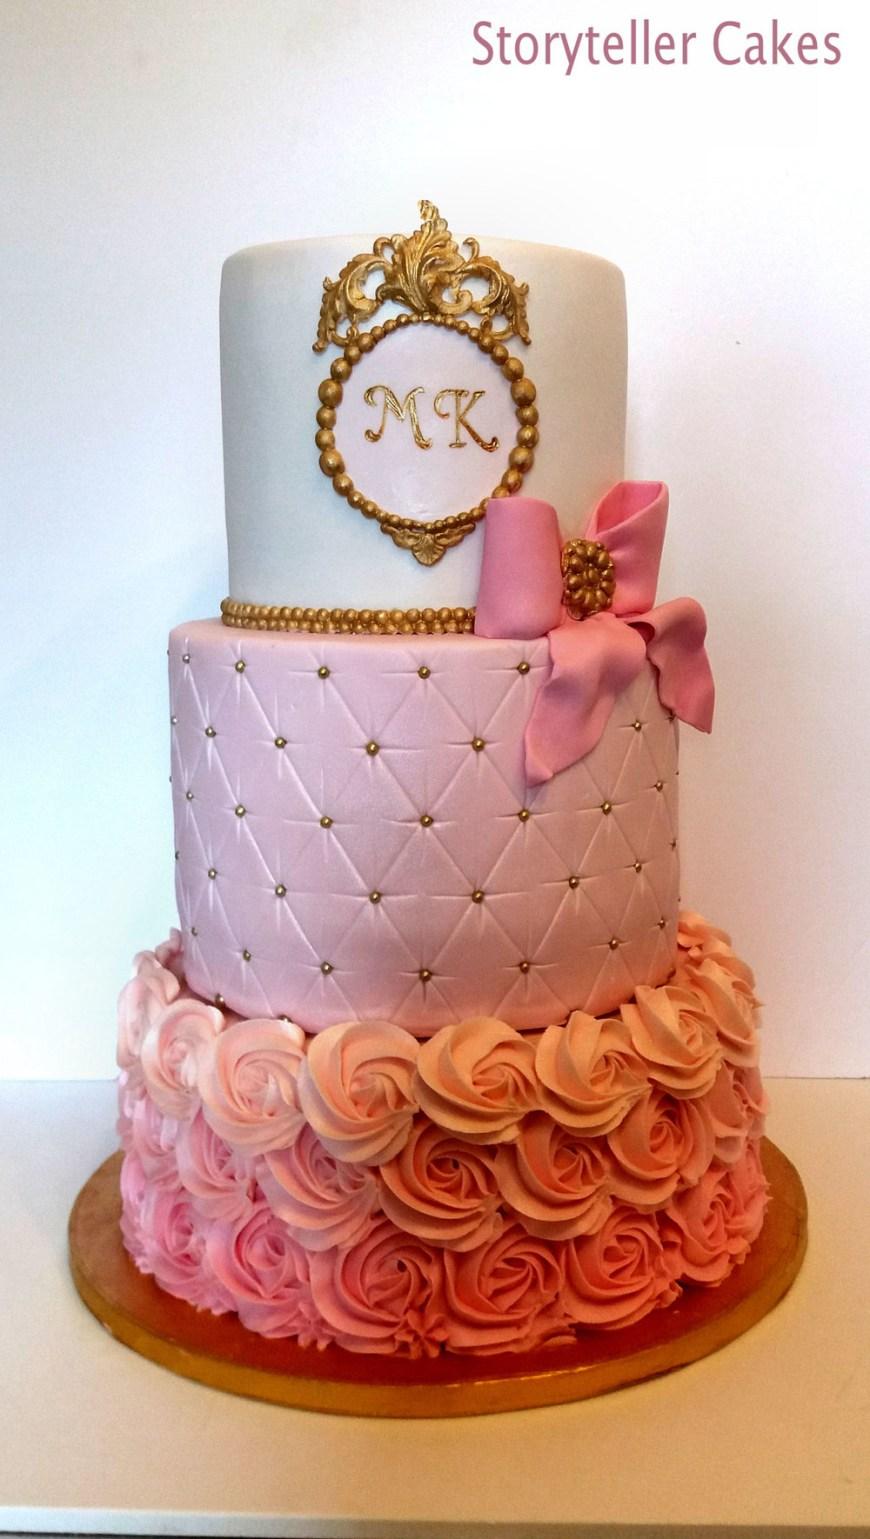 Pink And Gold Birthday Cake Christening Ba Shower Cakes Storyteller Cakes